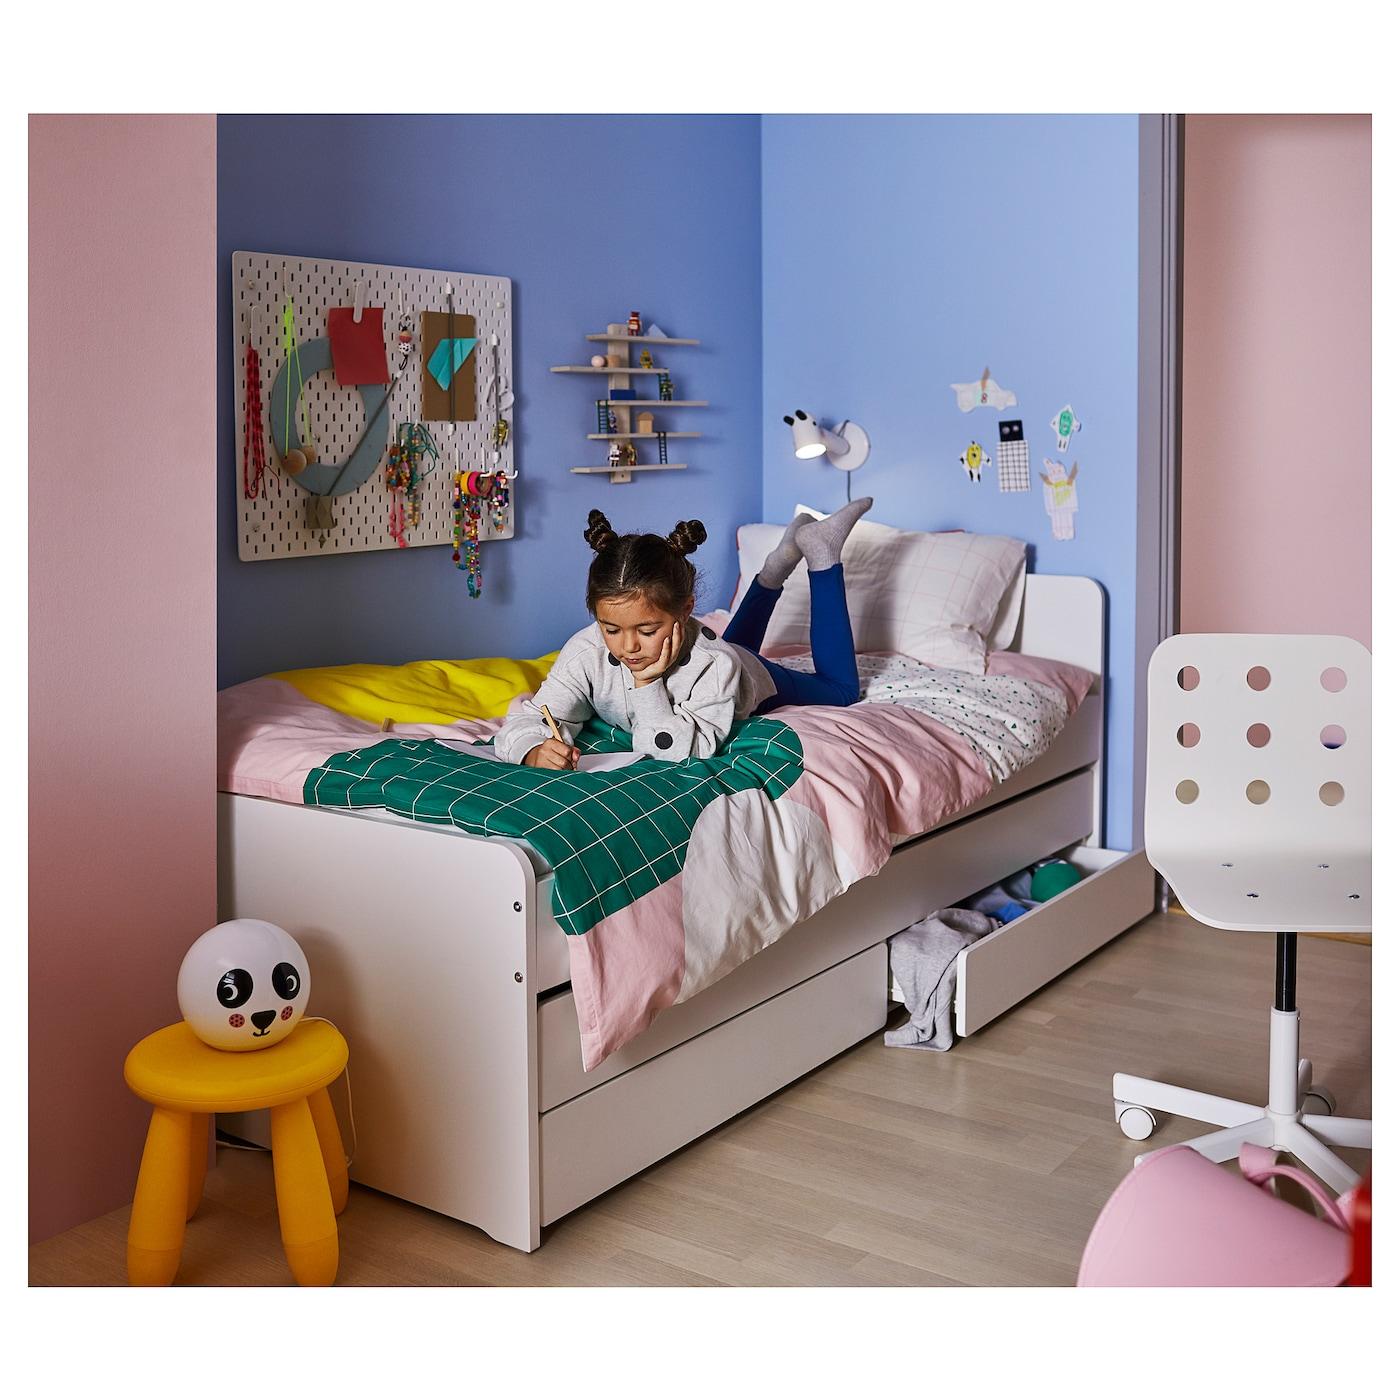 Full Size of Bett Mit Unterbett Slkt Bettgestell Betten Bei Ikea Boxspring Hohes Kopfteil Gepolstertem 90x200 Lattenrost Und Matratze Wohnwert Grau Weiß 160x200 Sofa Bett Bett Mit Unterbett